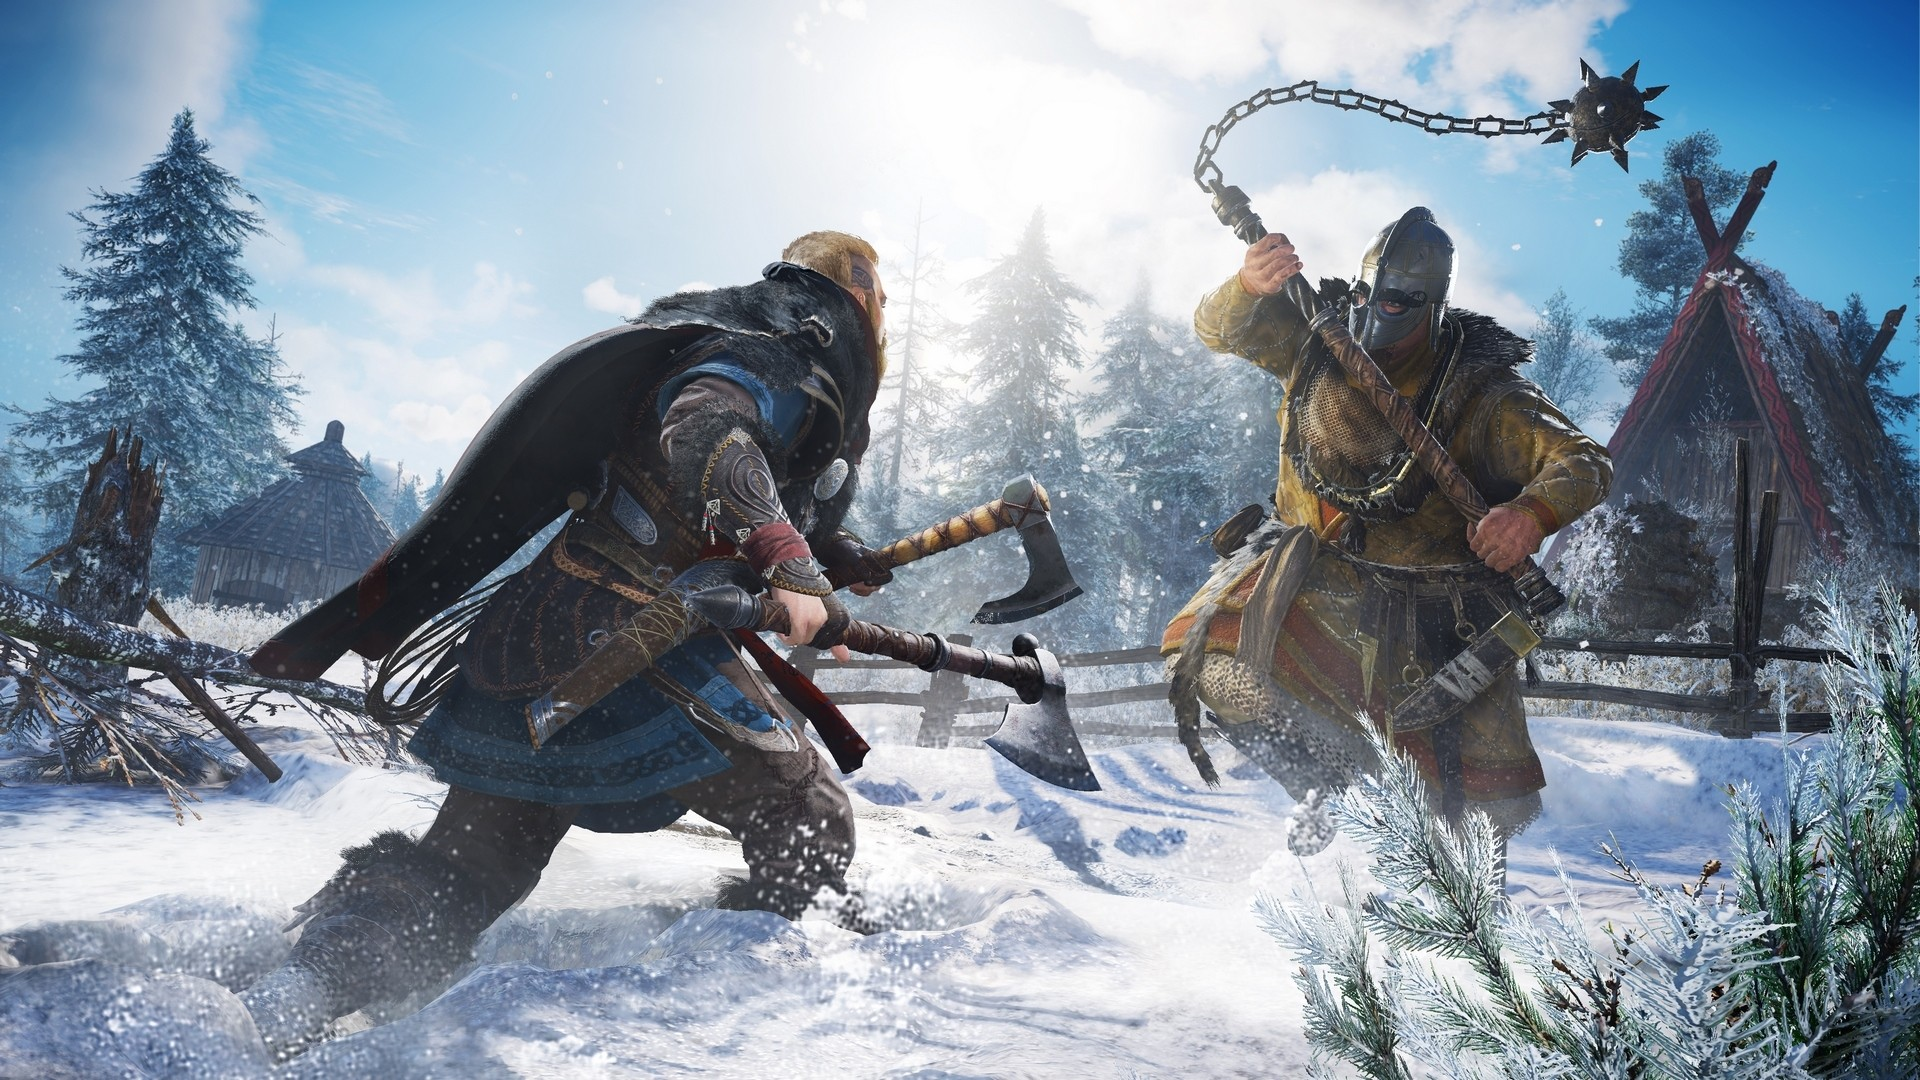 Assassins Creed Valhalla Wallpaper theme